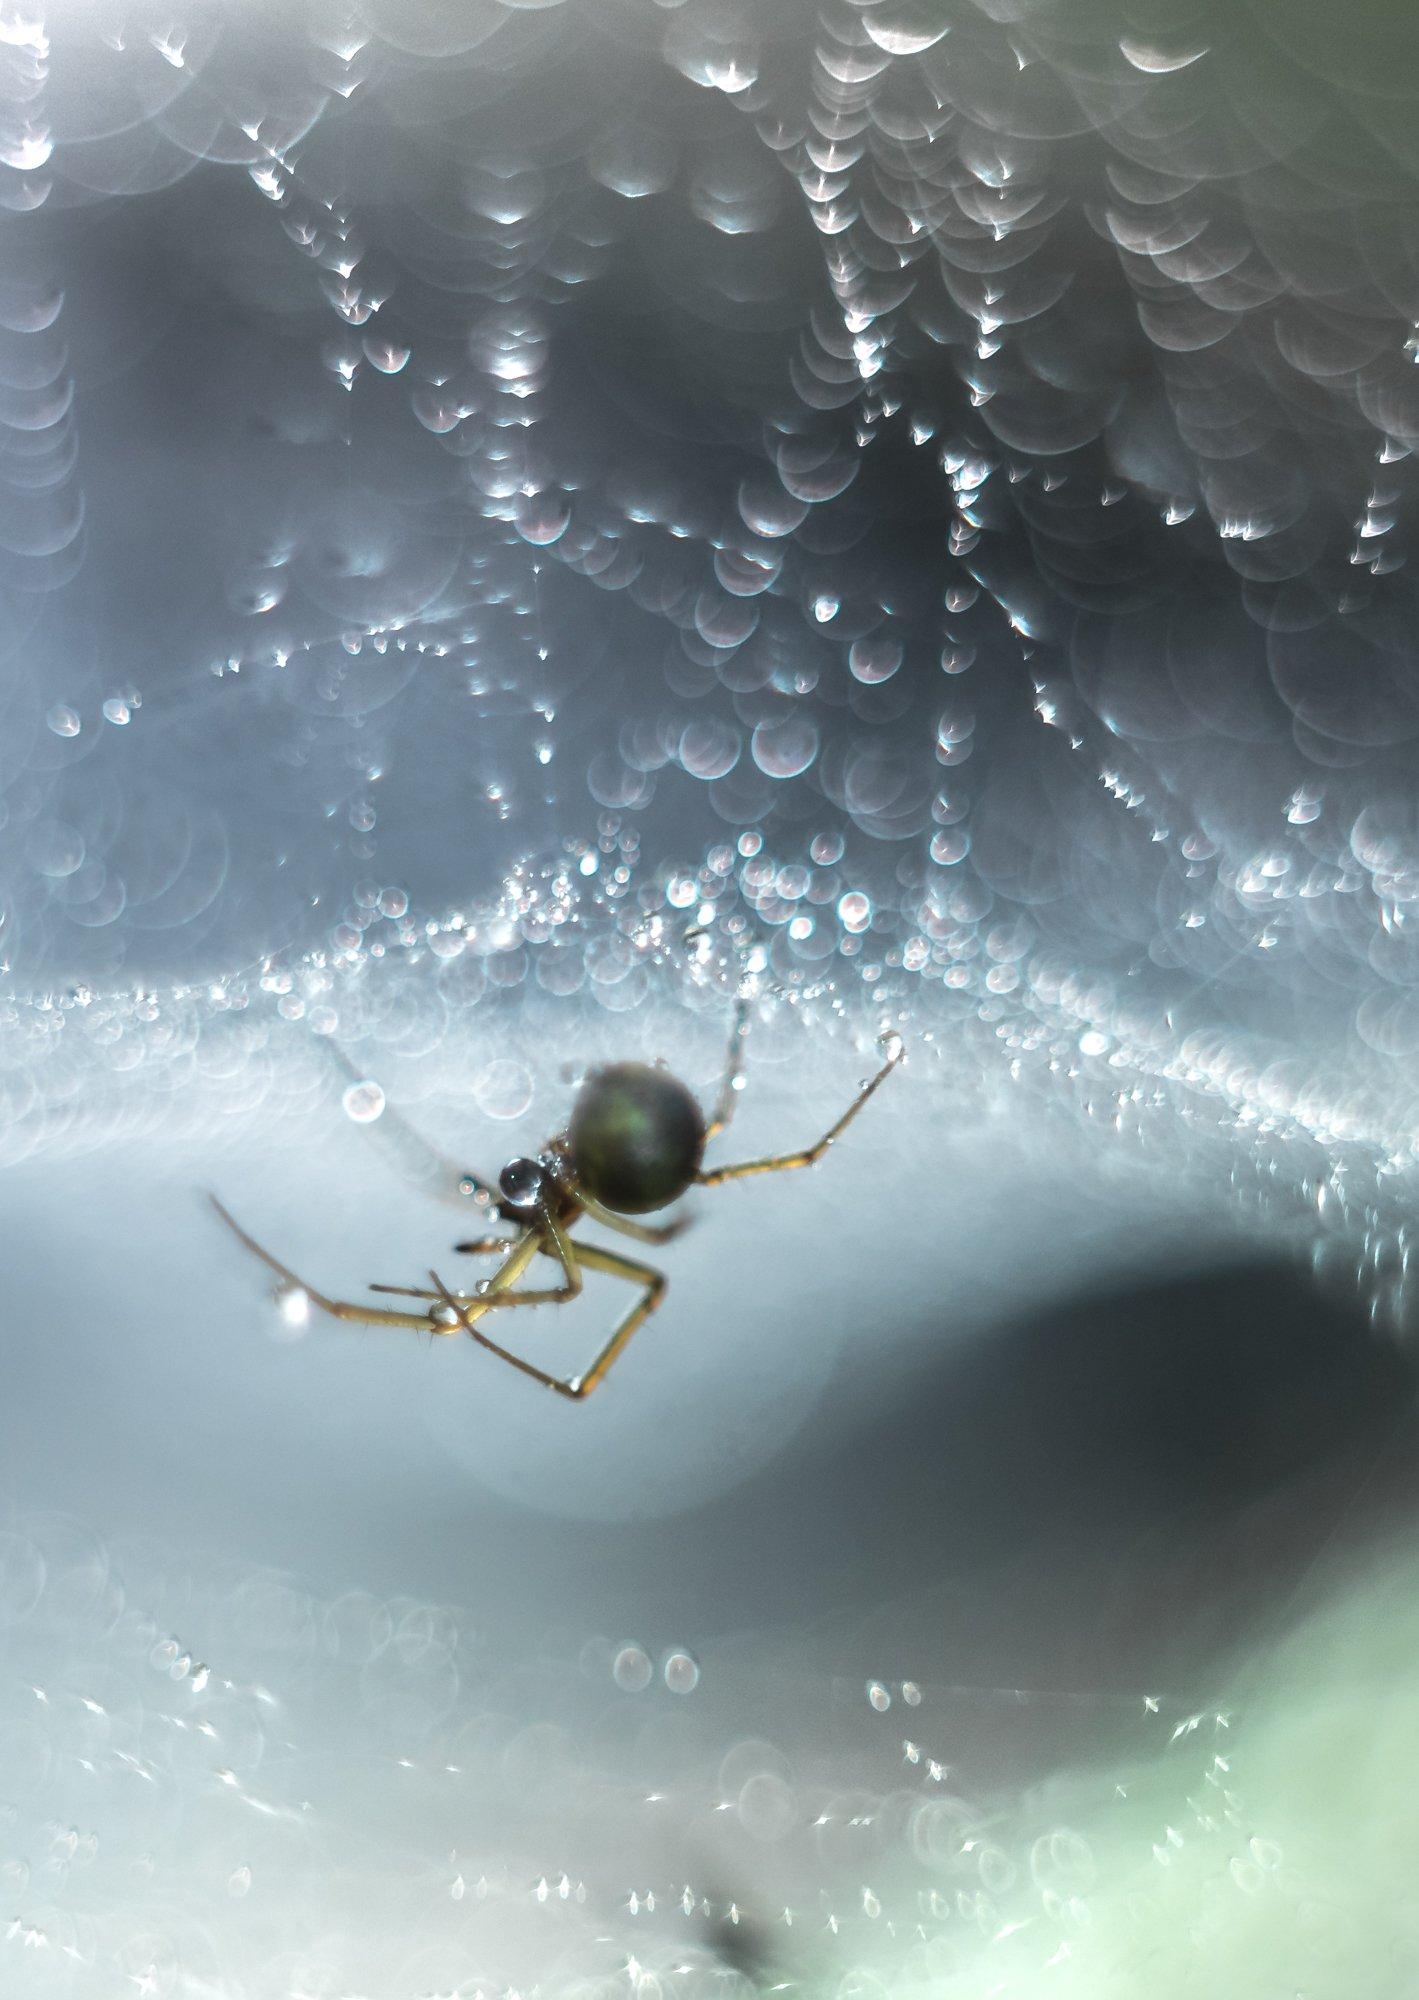 spider, insect, macro, helios 58mm, f/2,, Sylwia Grabinska